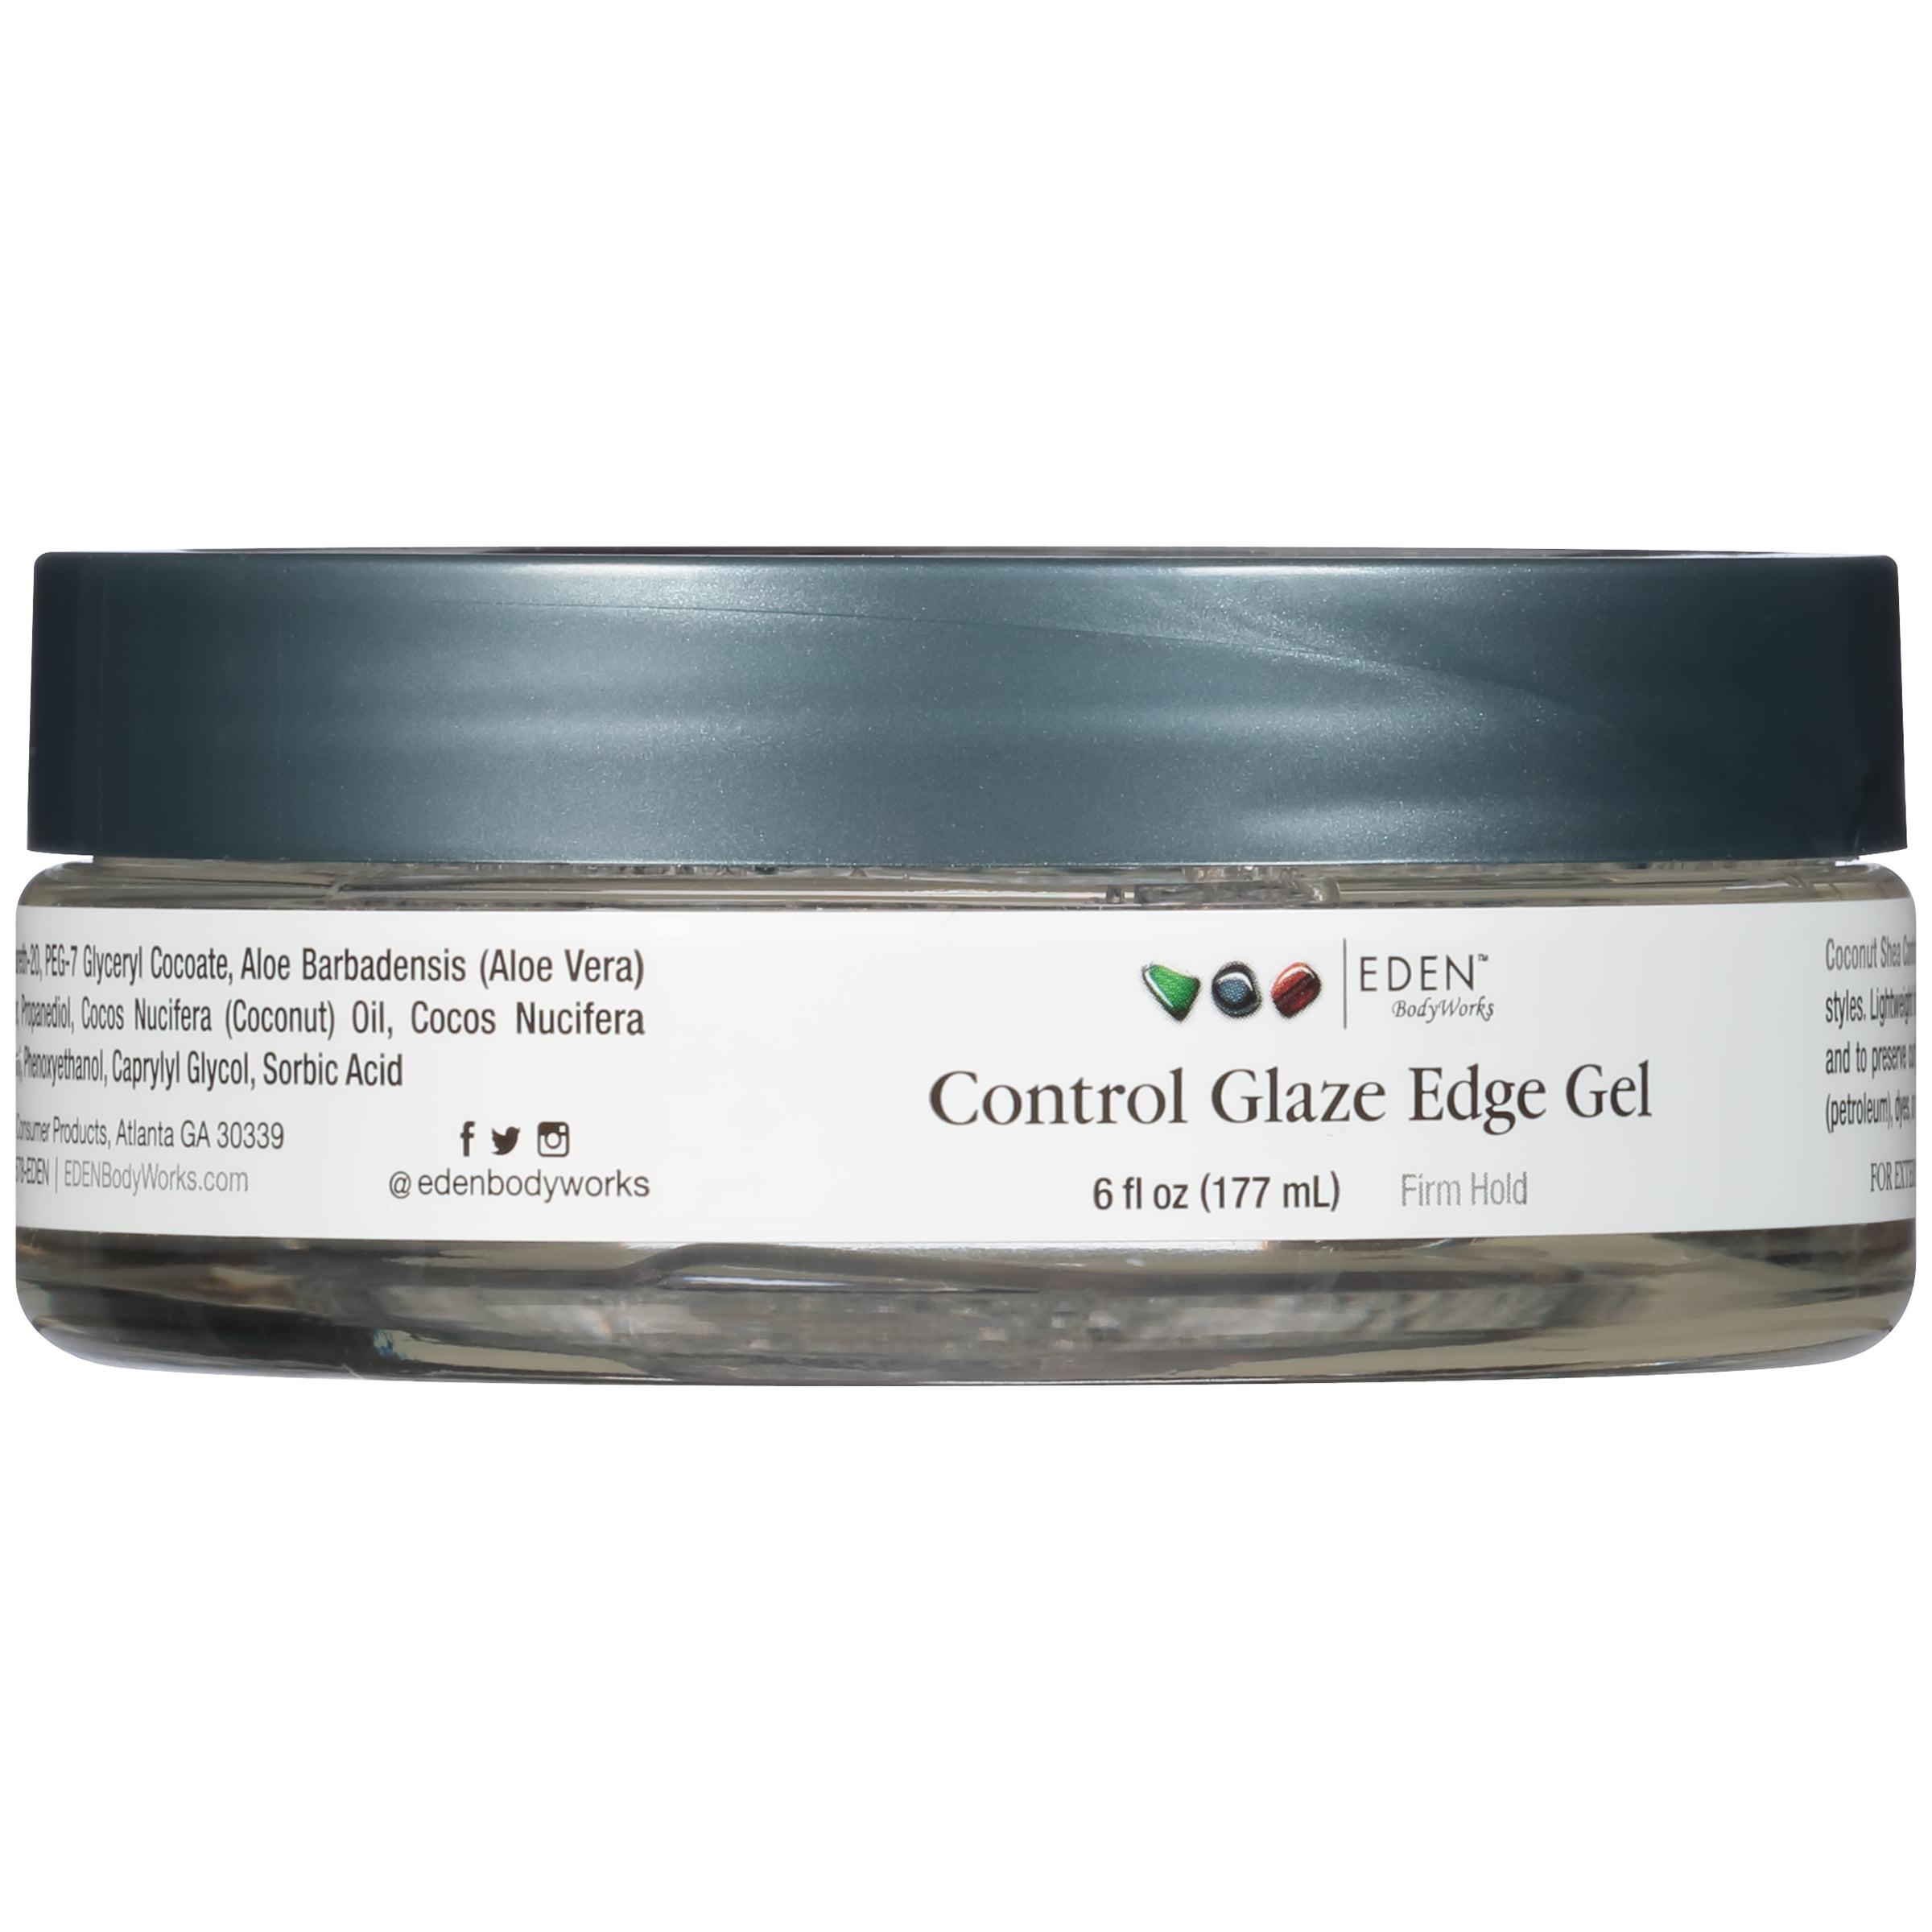 Eden BodyWorks Coconut Shea Control Glaze Edge Gel, 6 oz